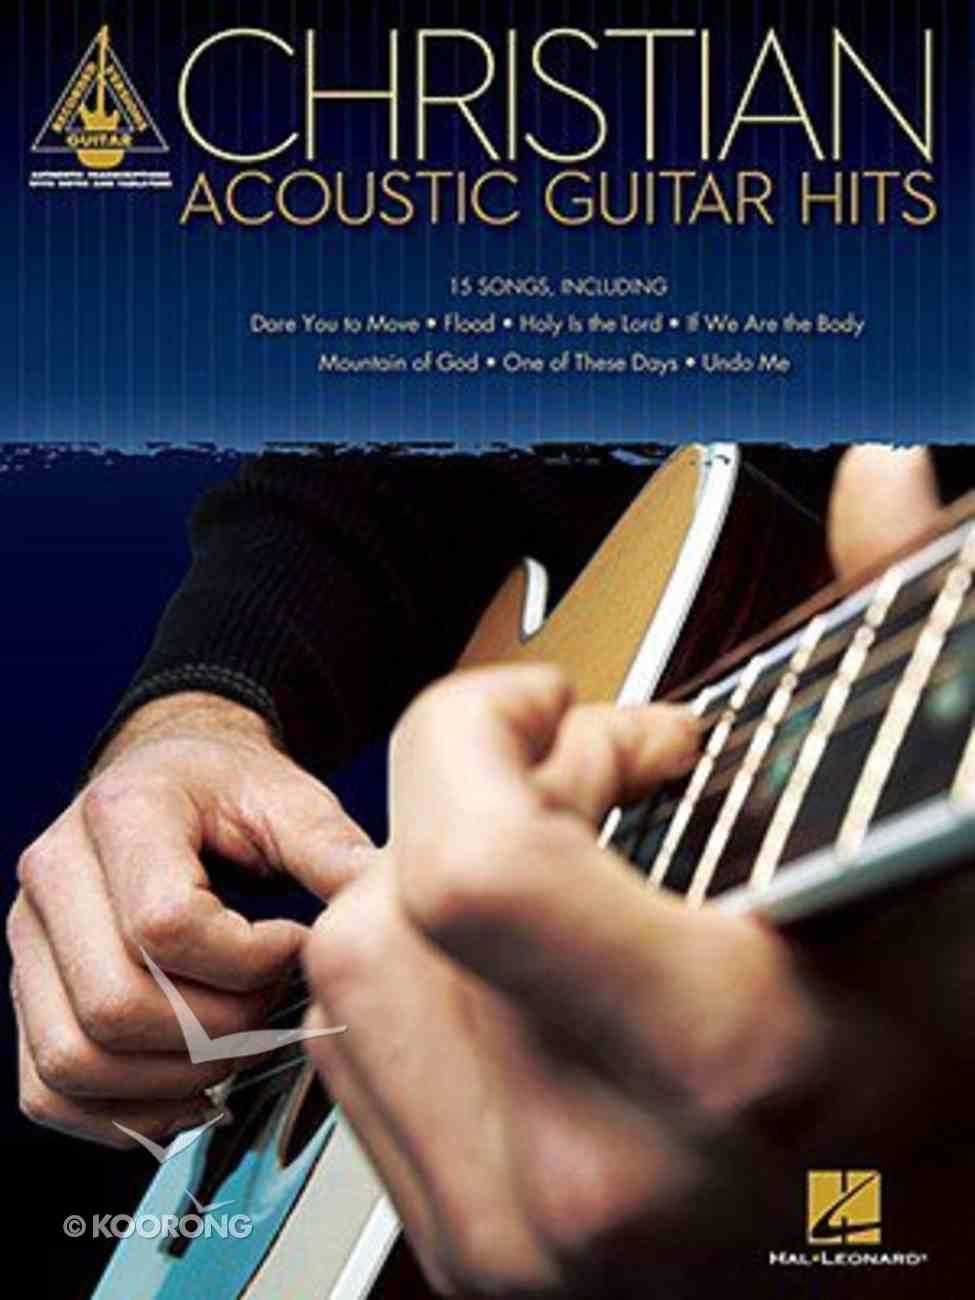 Christian Acoustic Guitar Hits (Music Book) Paperback